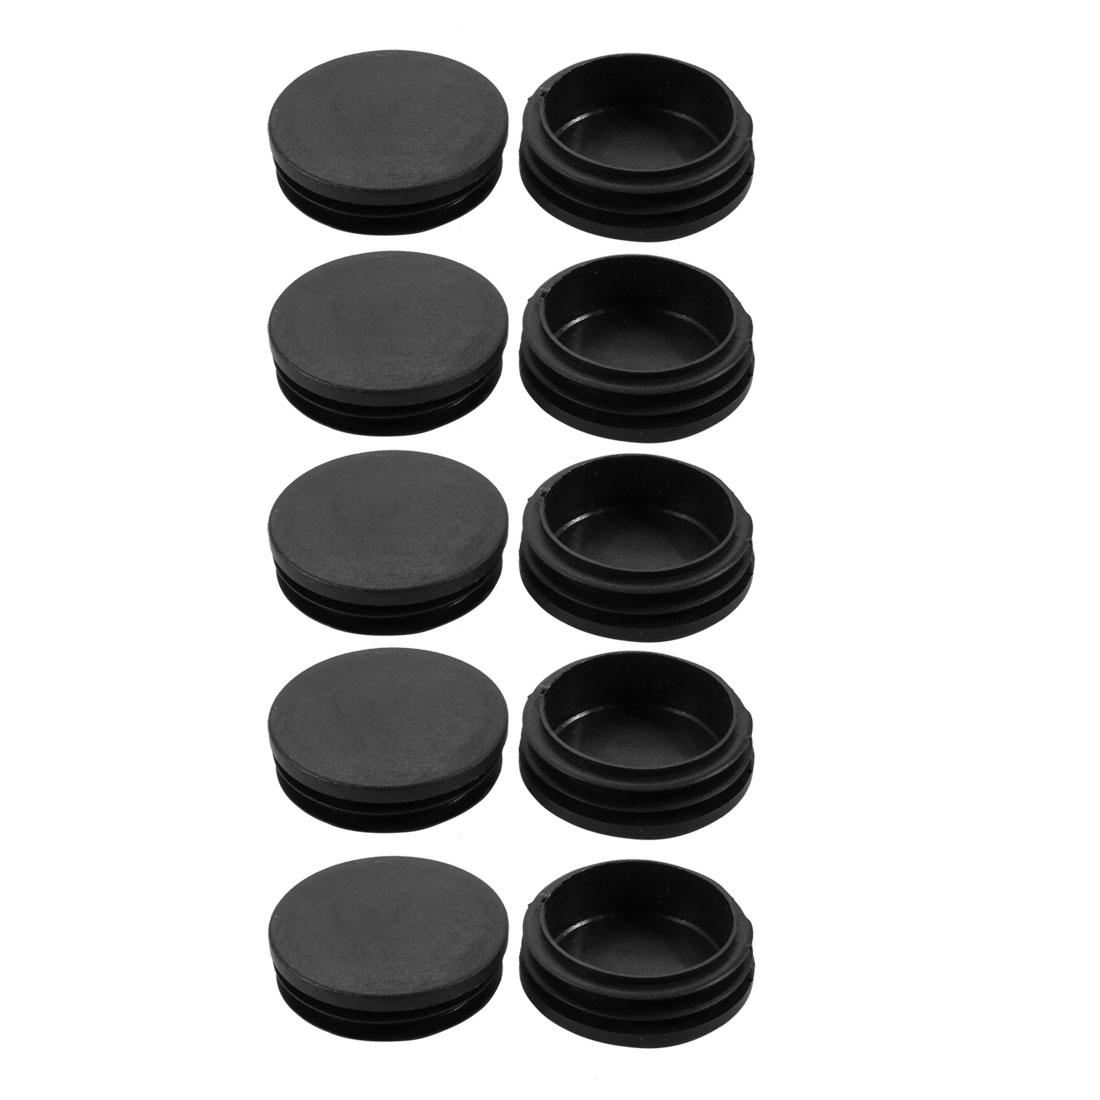 10pcs 60mm Dia Black Plastic Round Cabinet Leg Insert Cover Protector